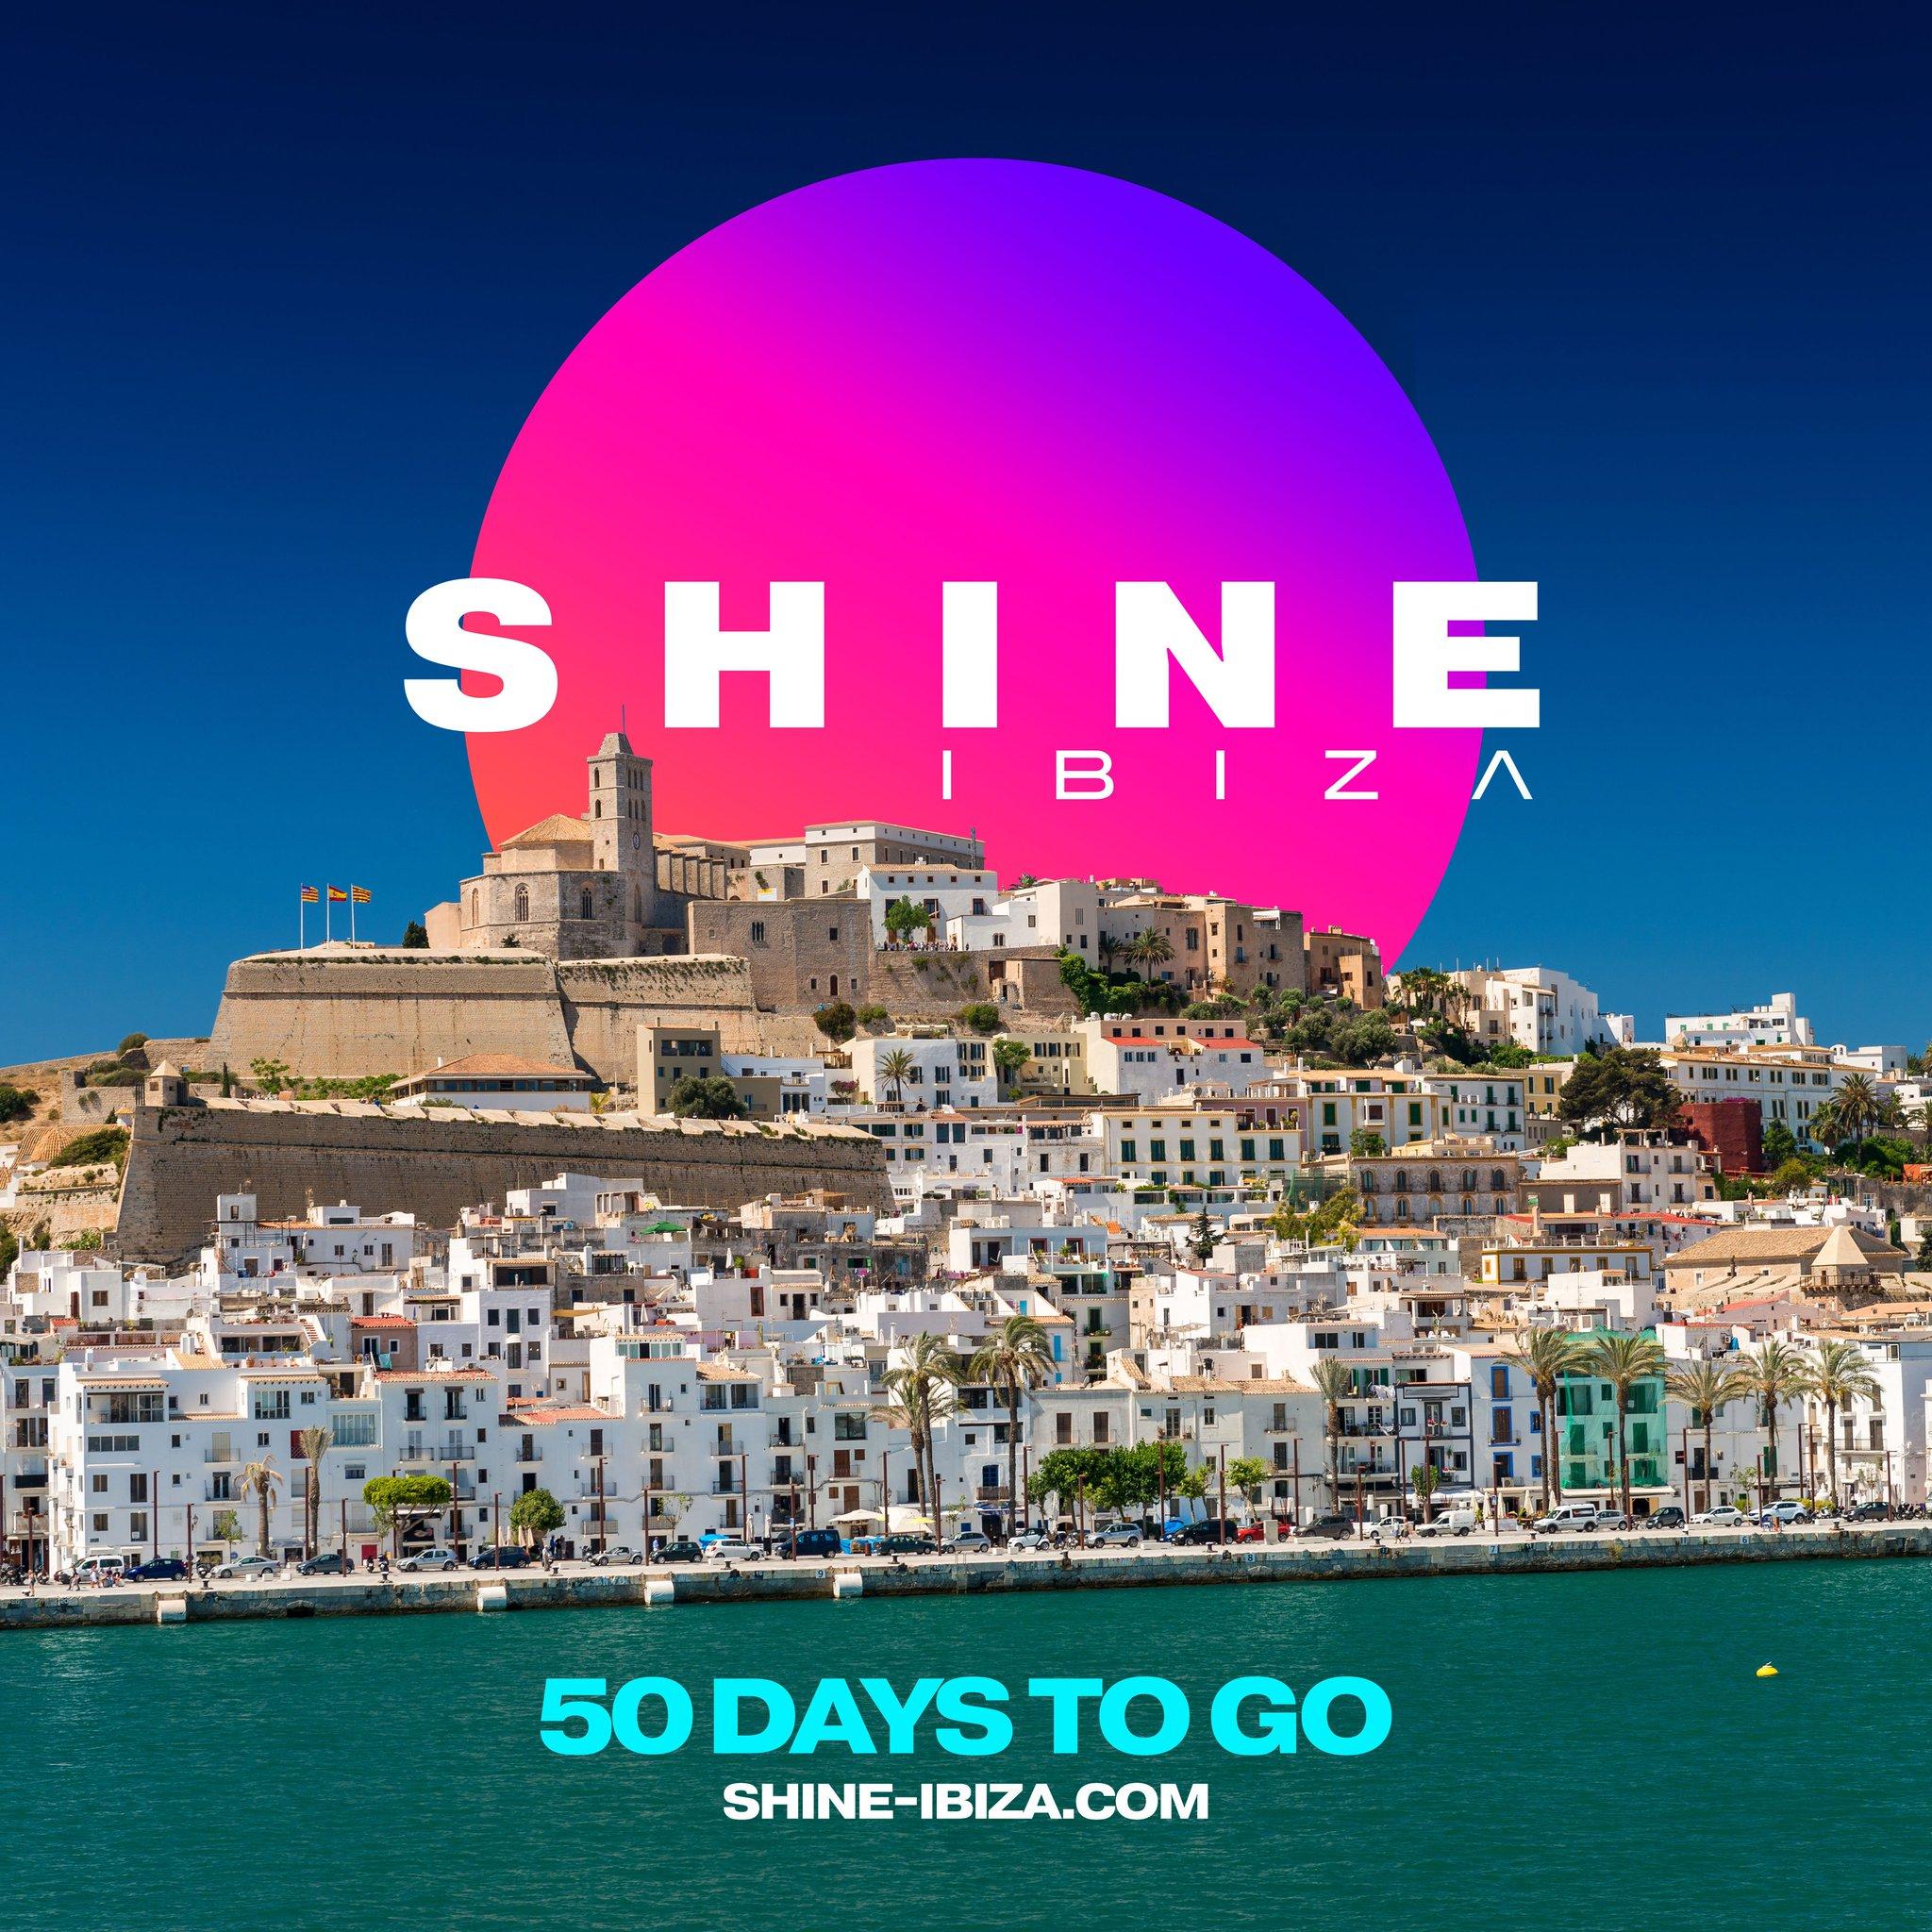 50 days until @SHINE_Ibiza! Book your tickets now  https://t.co/ld08msqglv https://t.co/kGA8TlMbci